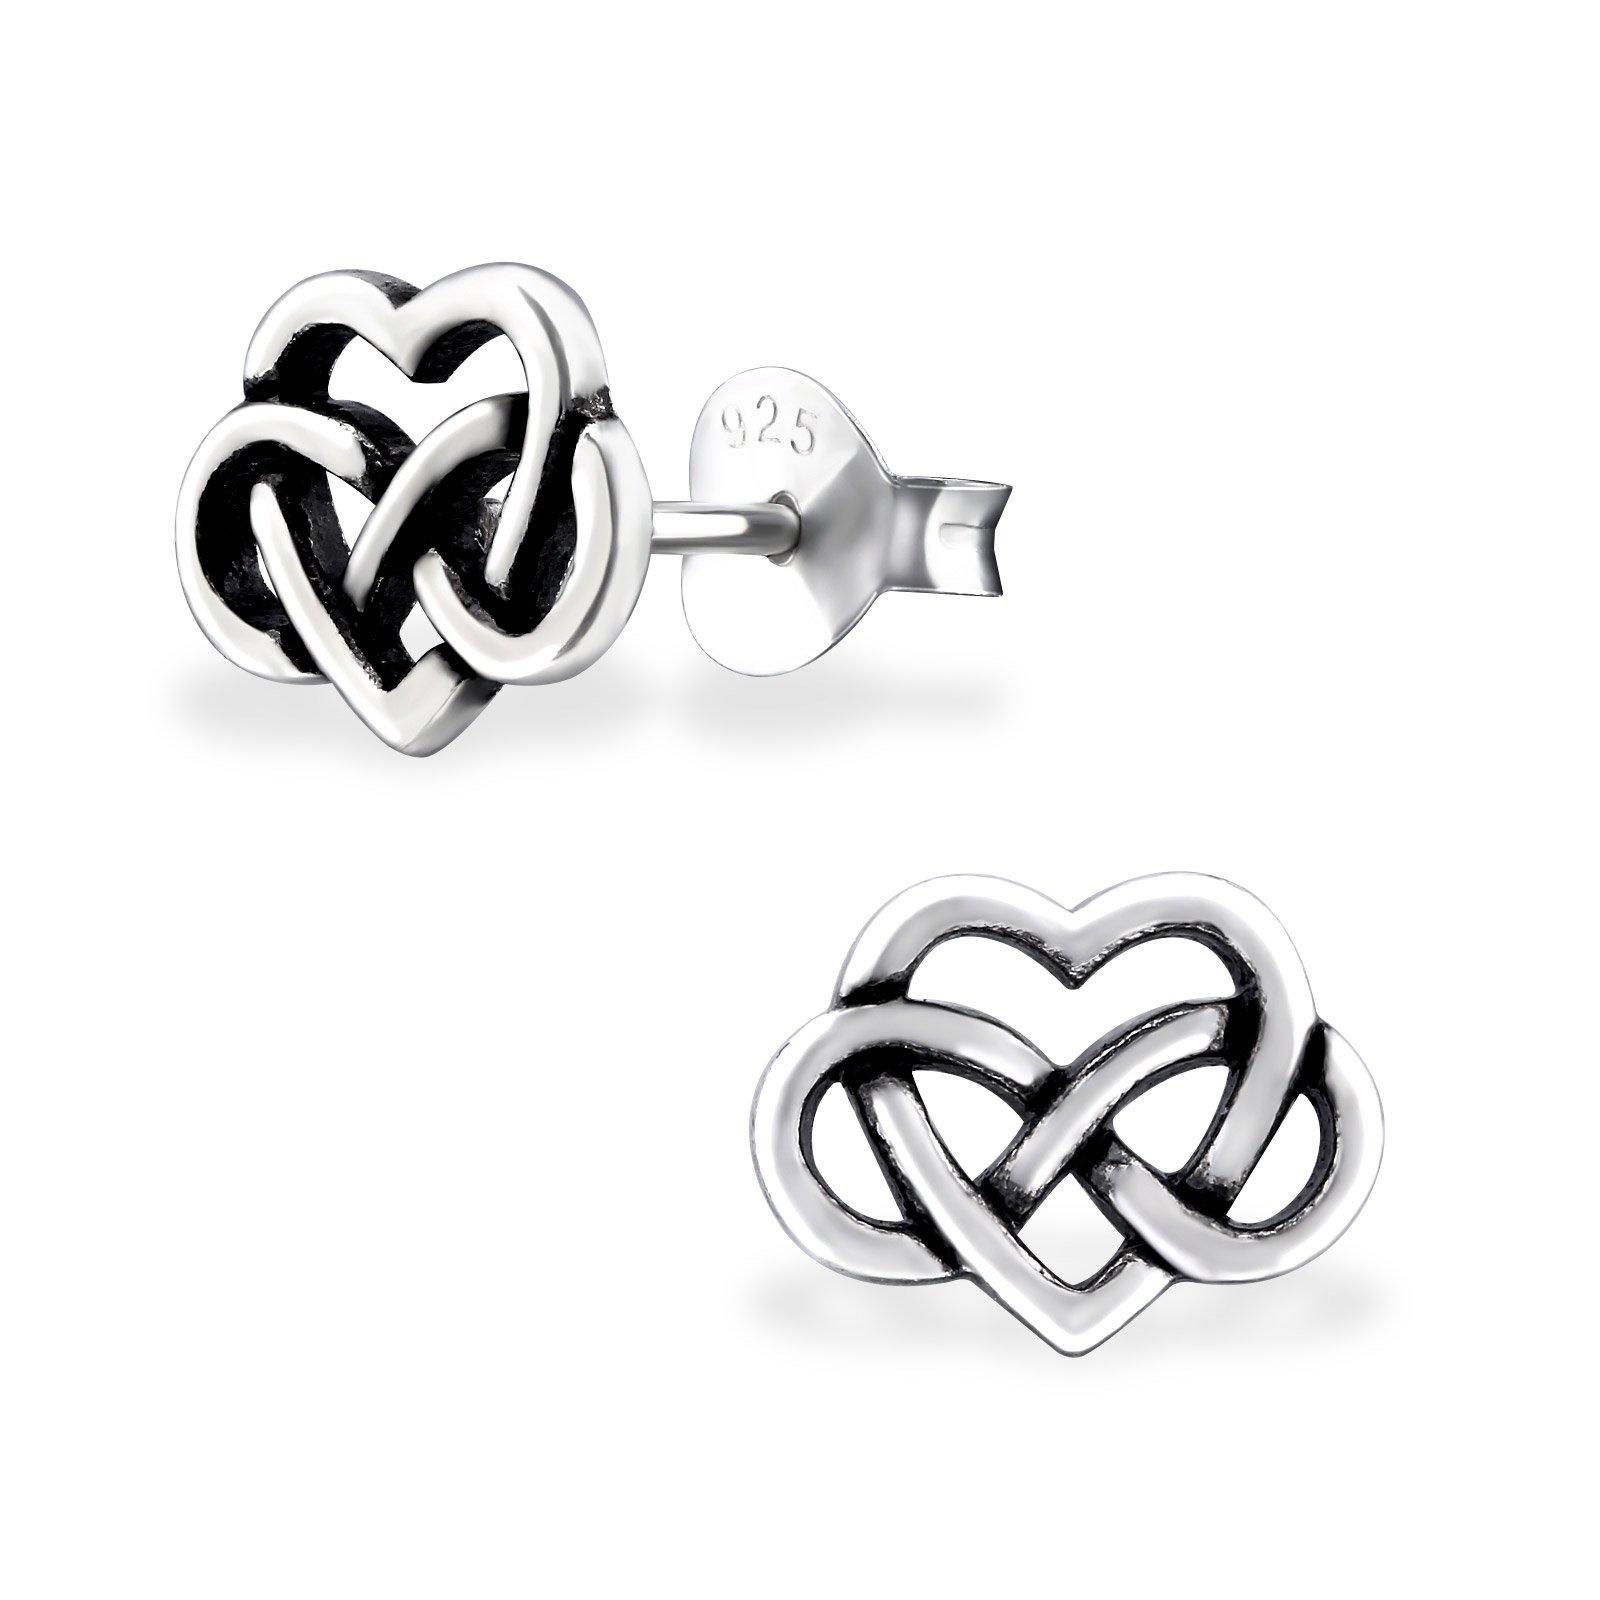 925 Sterling Silver Hypoallergenic Infinity Love Heart Stud Earrings for Girls 31603